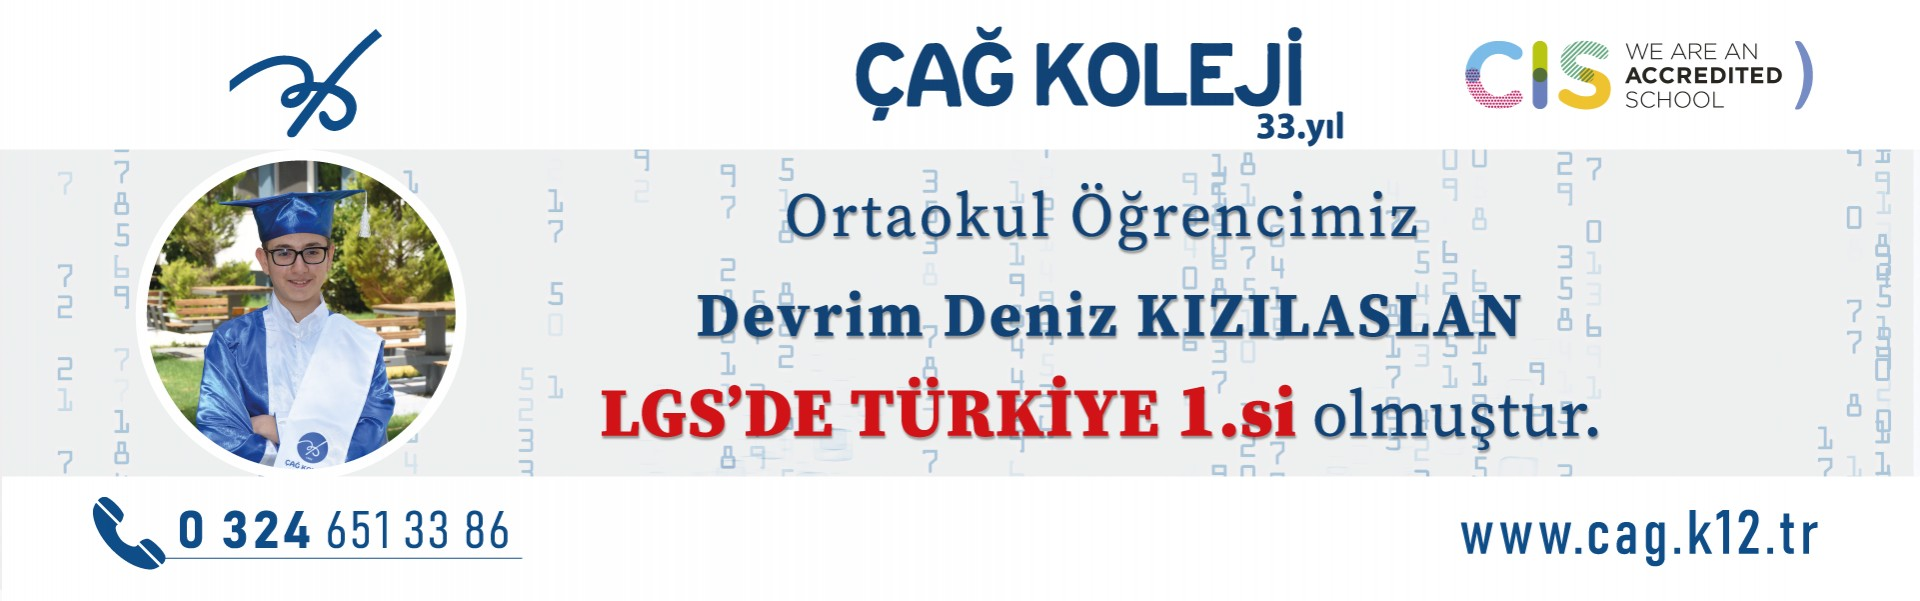 www cag k12 tr